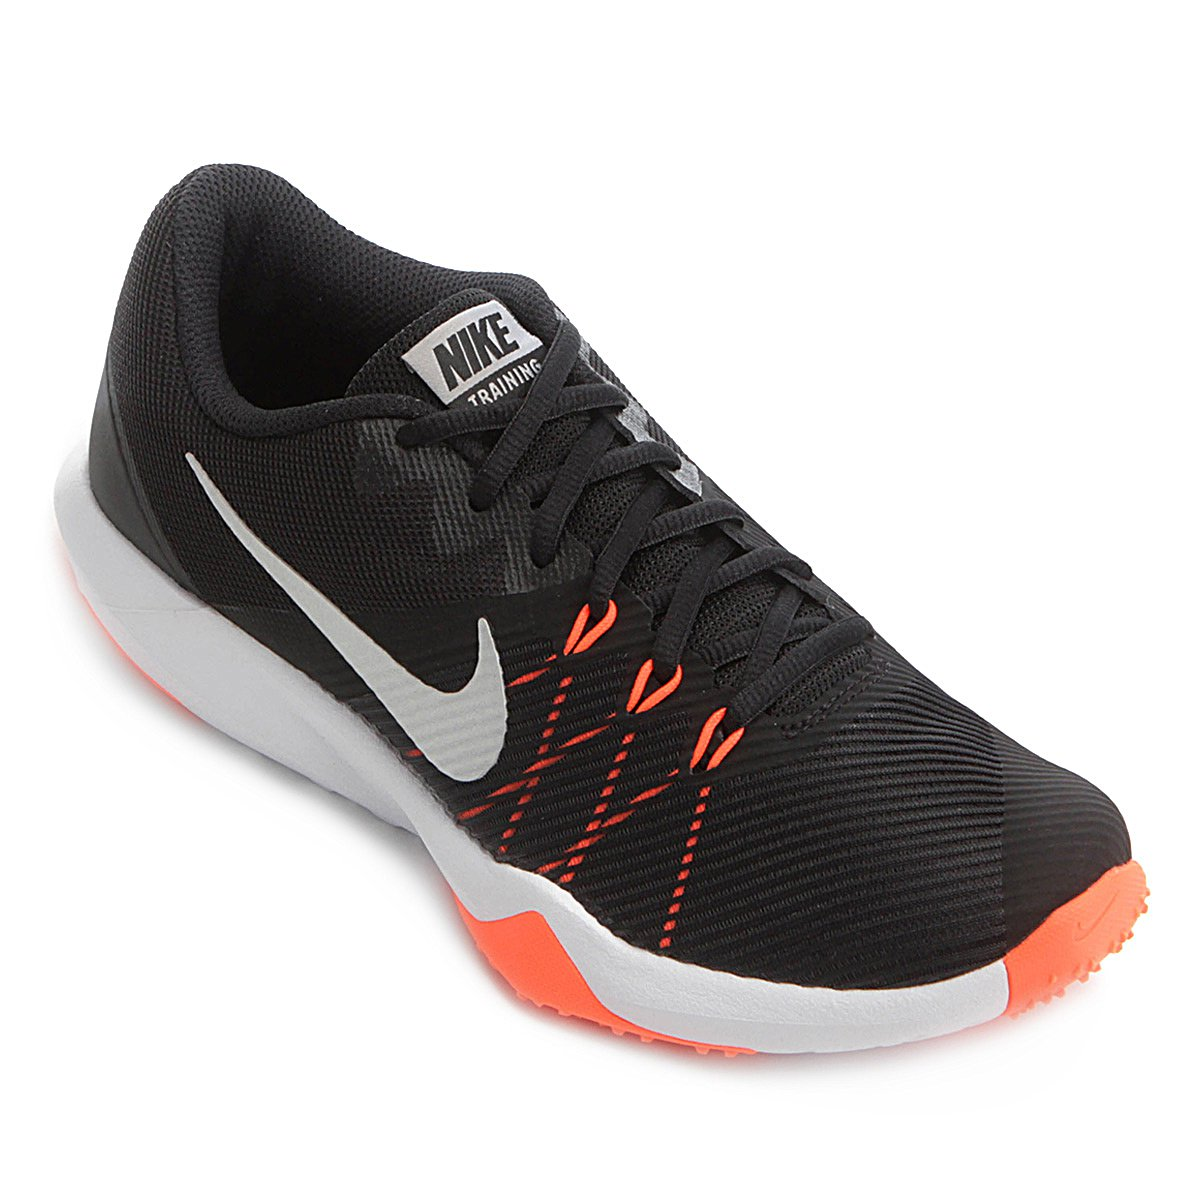 1592ce3f9ba Tênis Nike Retaliation TR Masculino - Preto e Laranja - Compre Agora ...